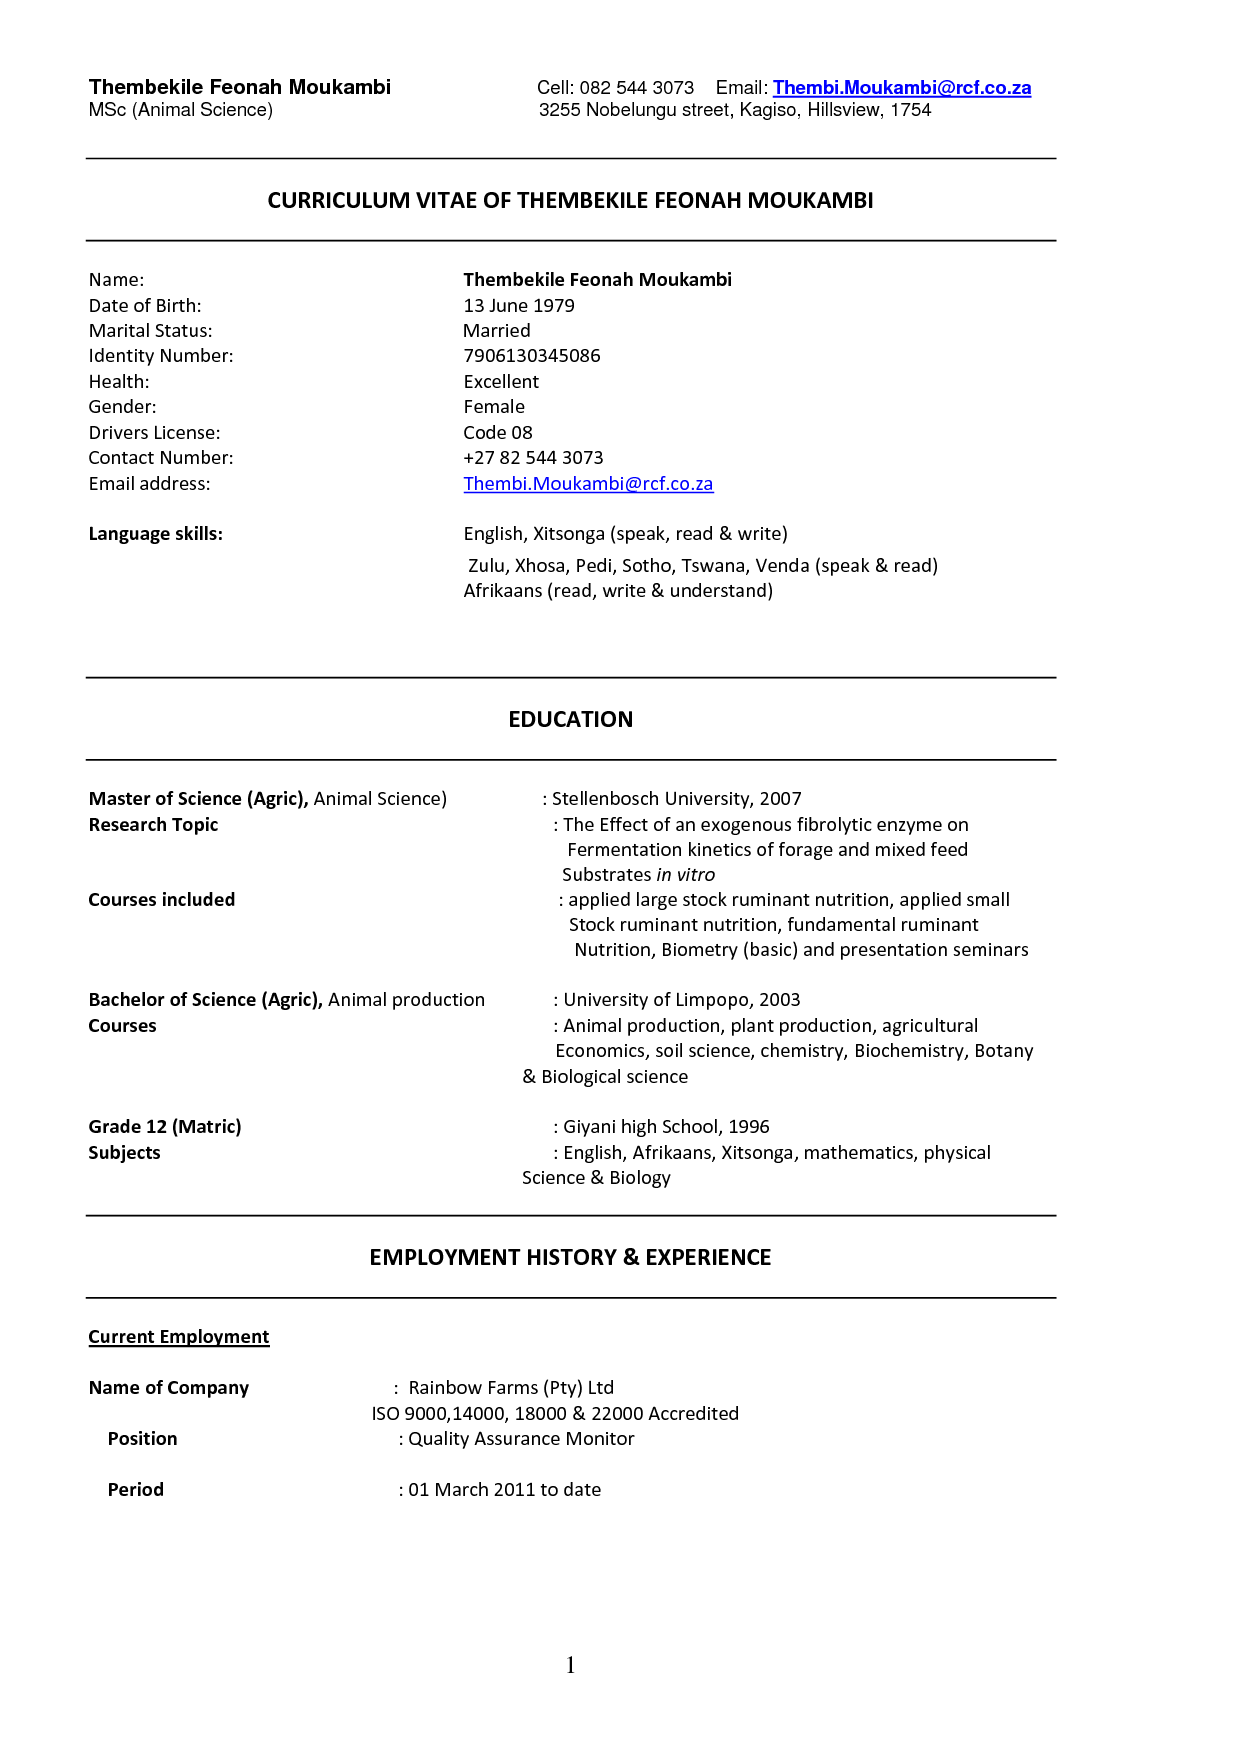 Cv Template Za Cv Template Cv Template Free Resume Templates